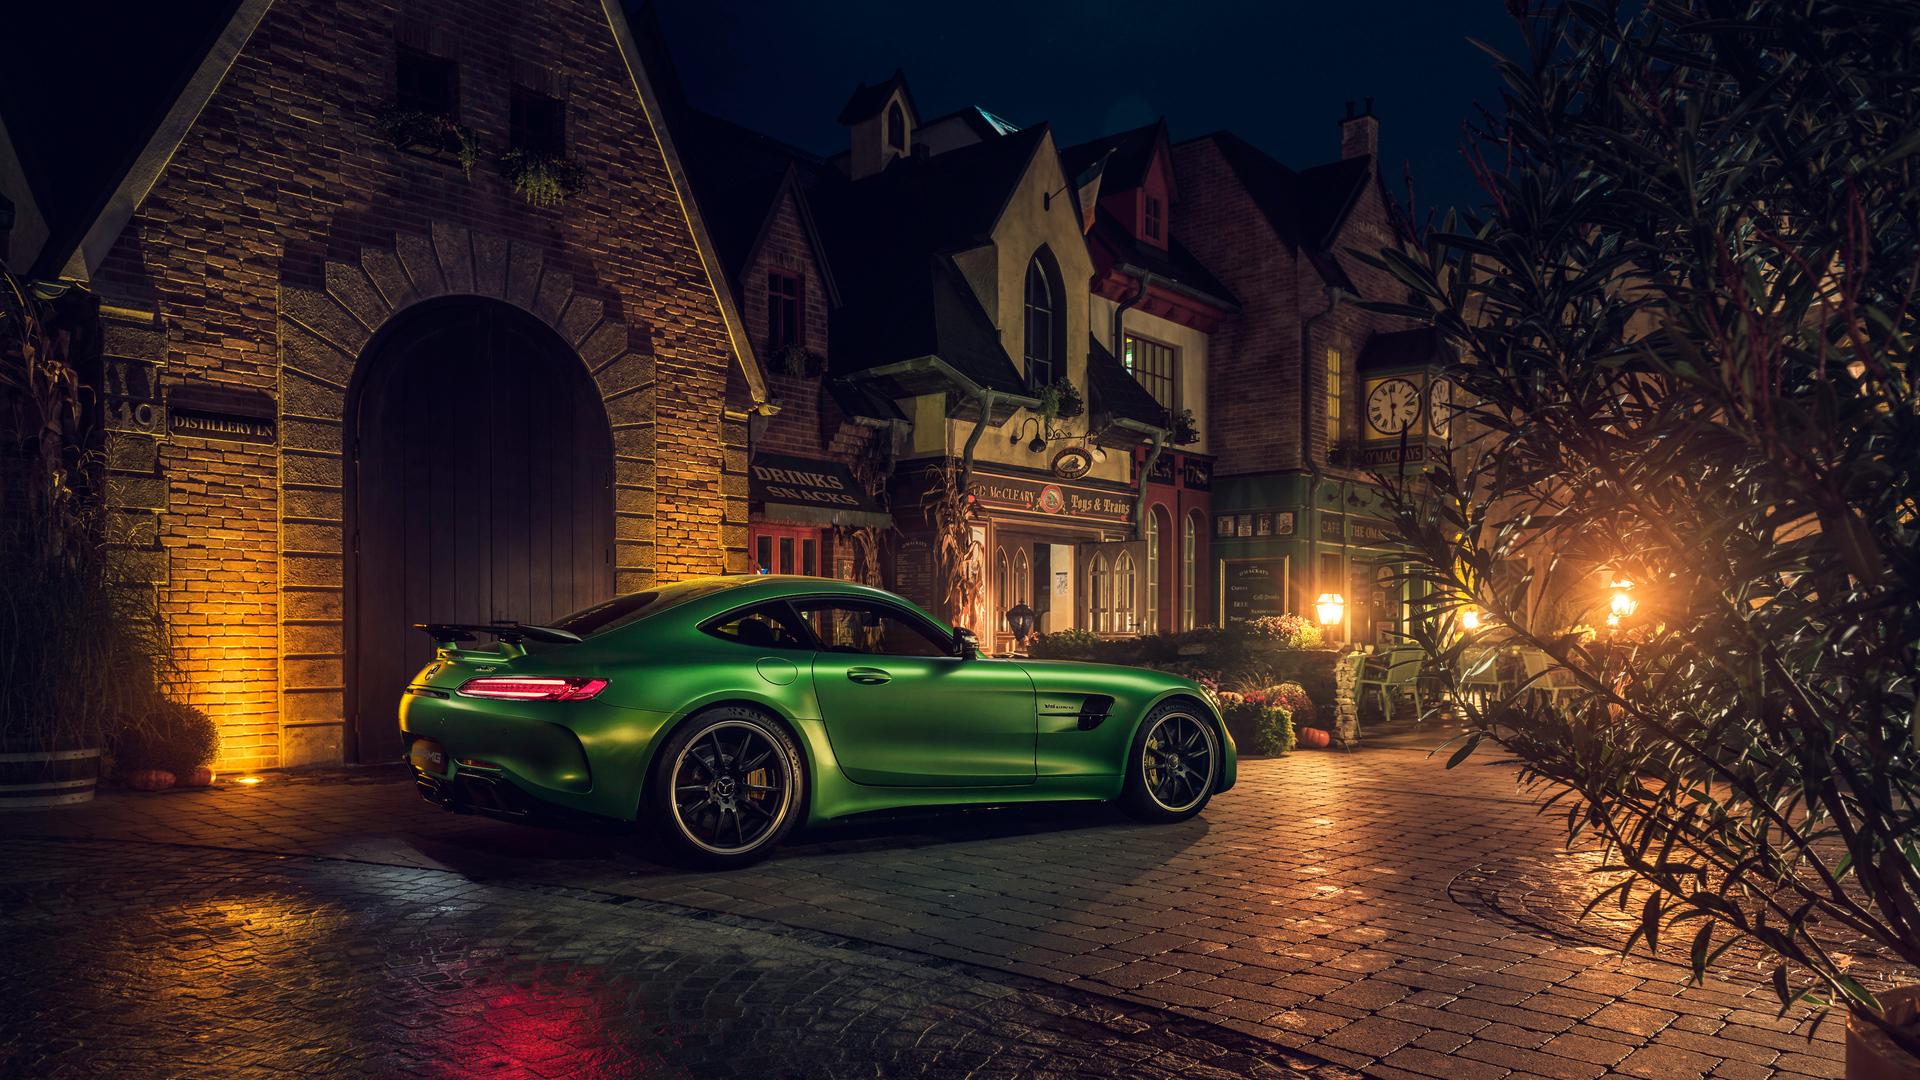 1920x1080 Green Mercedes AMG GT R Rear 4k Laptop Full HD ...